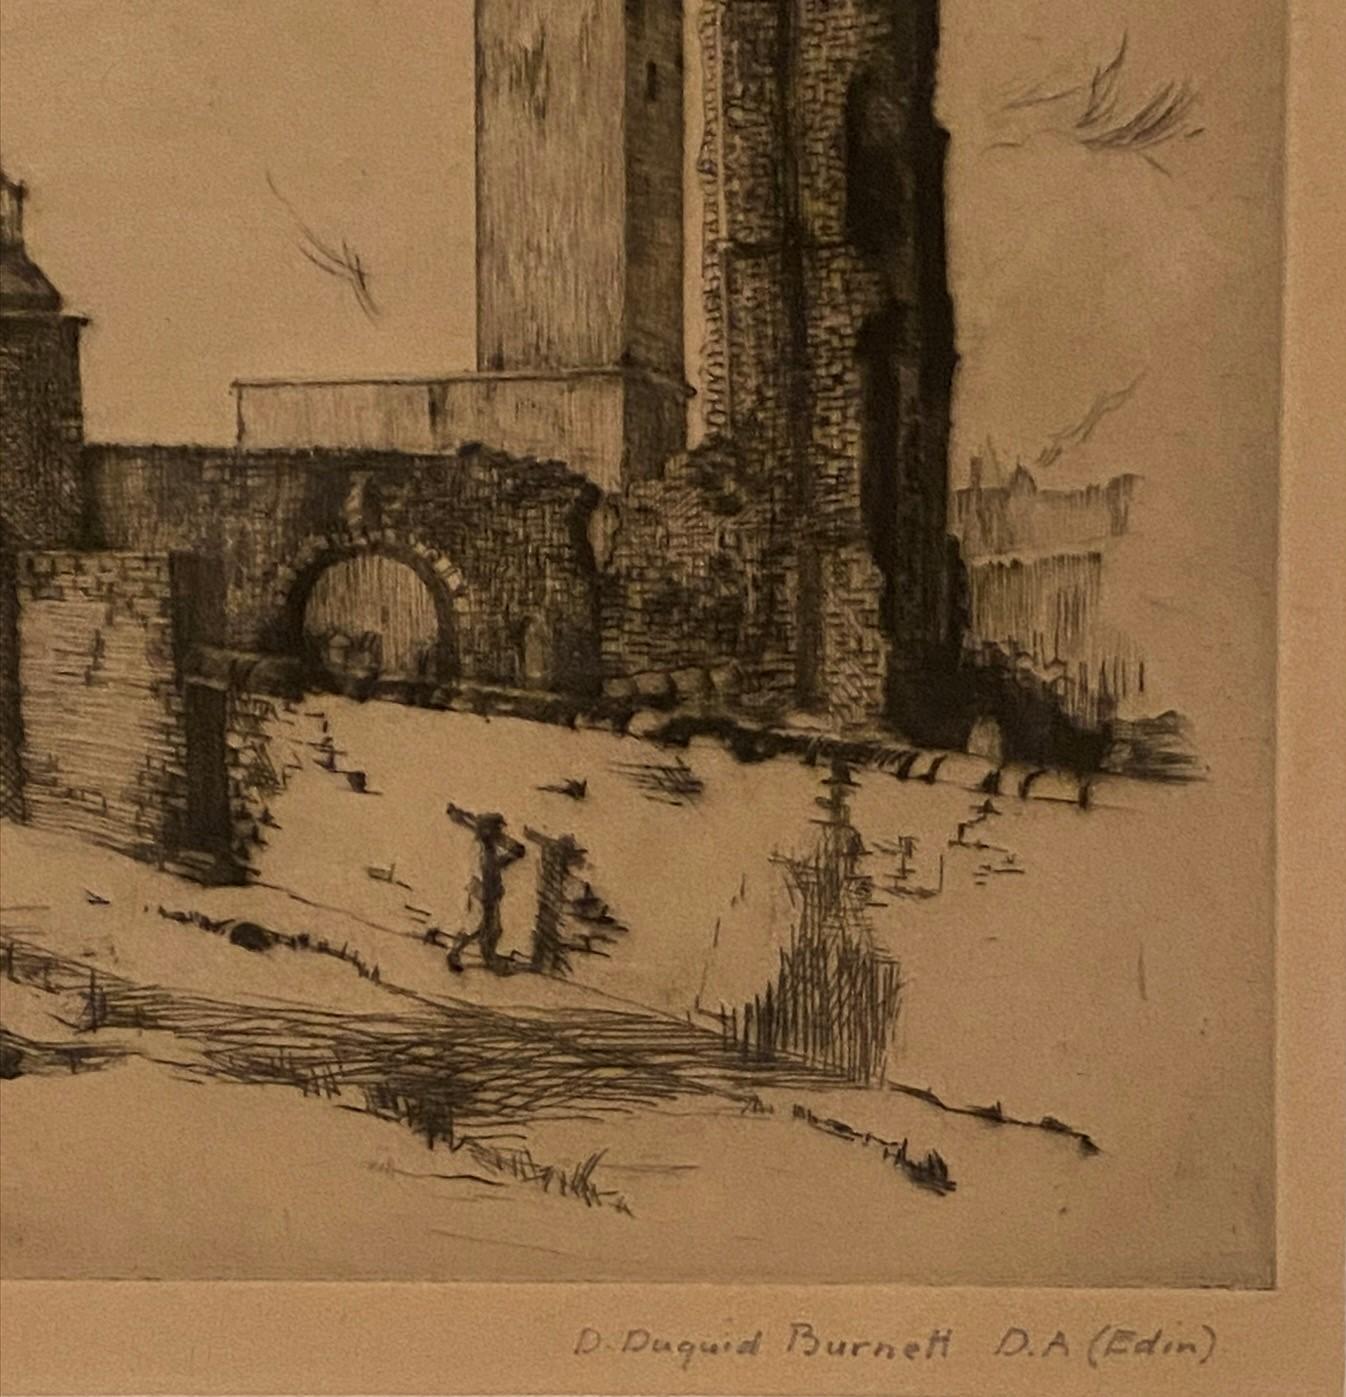 Pencil signed etching by D Dugaird Burnett D.A Edinburgh – Edinburgh View - Image 2 of 3